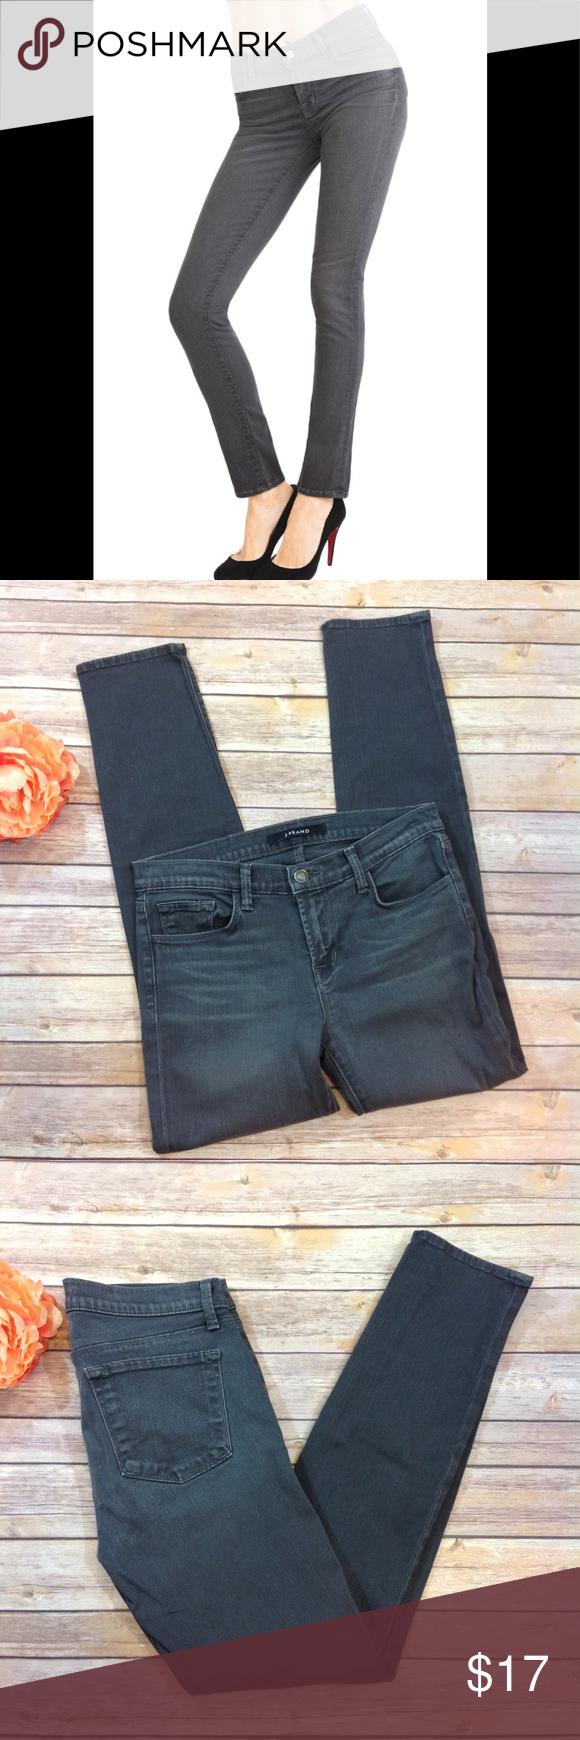 ae73e9398d42 J Brand Skinny Leg Dare Jeans J Brand Skinny Leg Dare Jeans. 15 inches hip  to hip. 8.5 inch rise. 28.5 inch inseam. J Brand Jeans Skinny